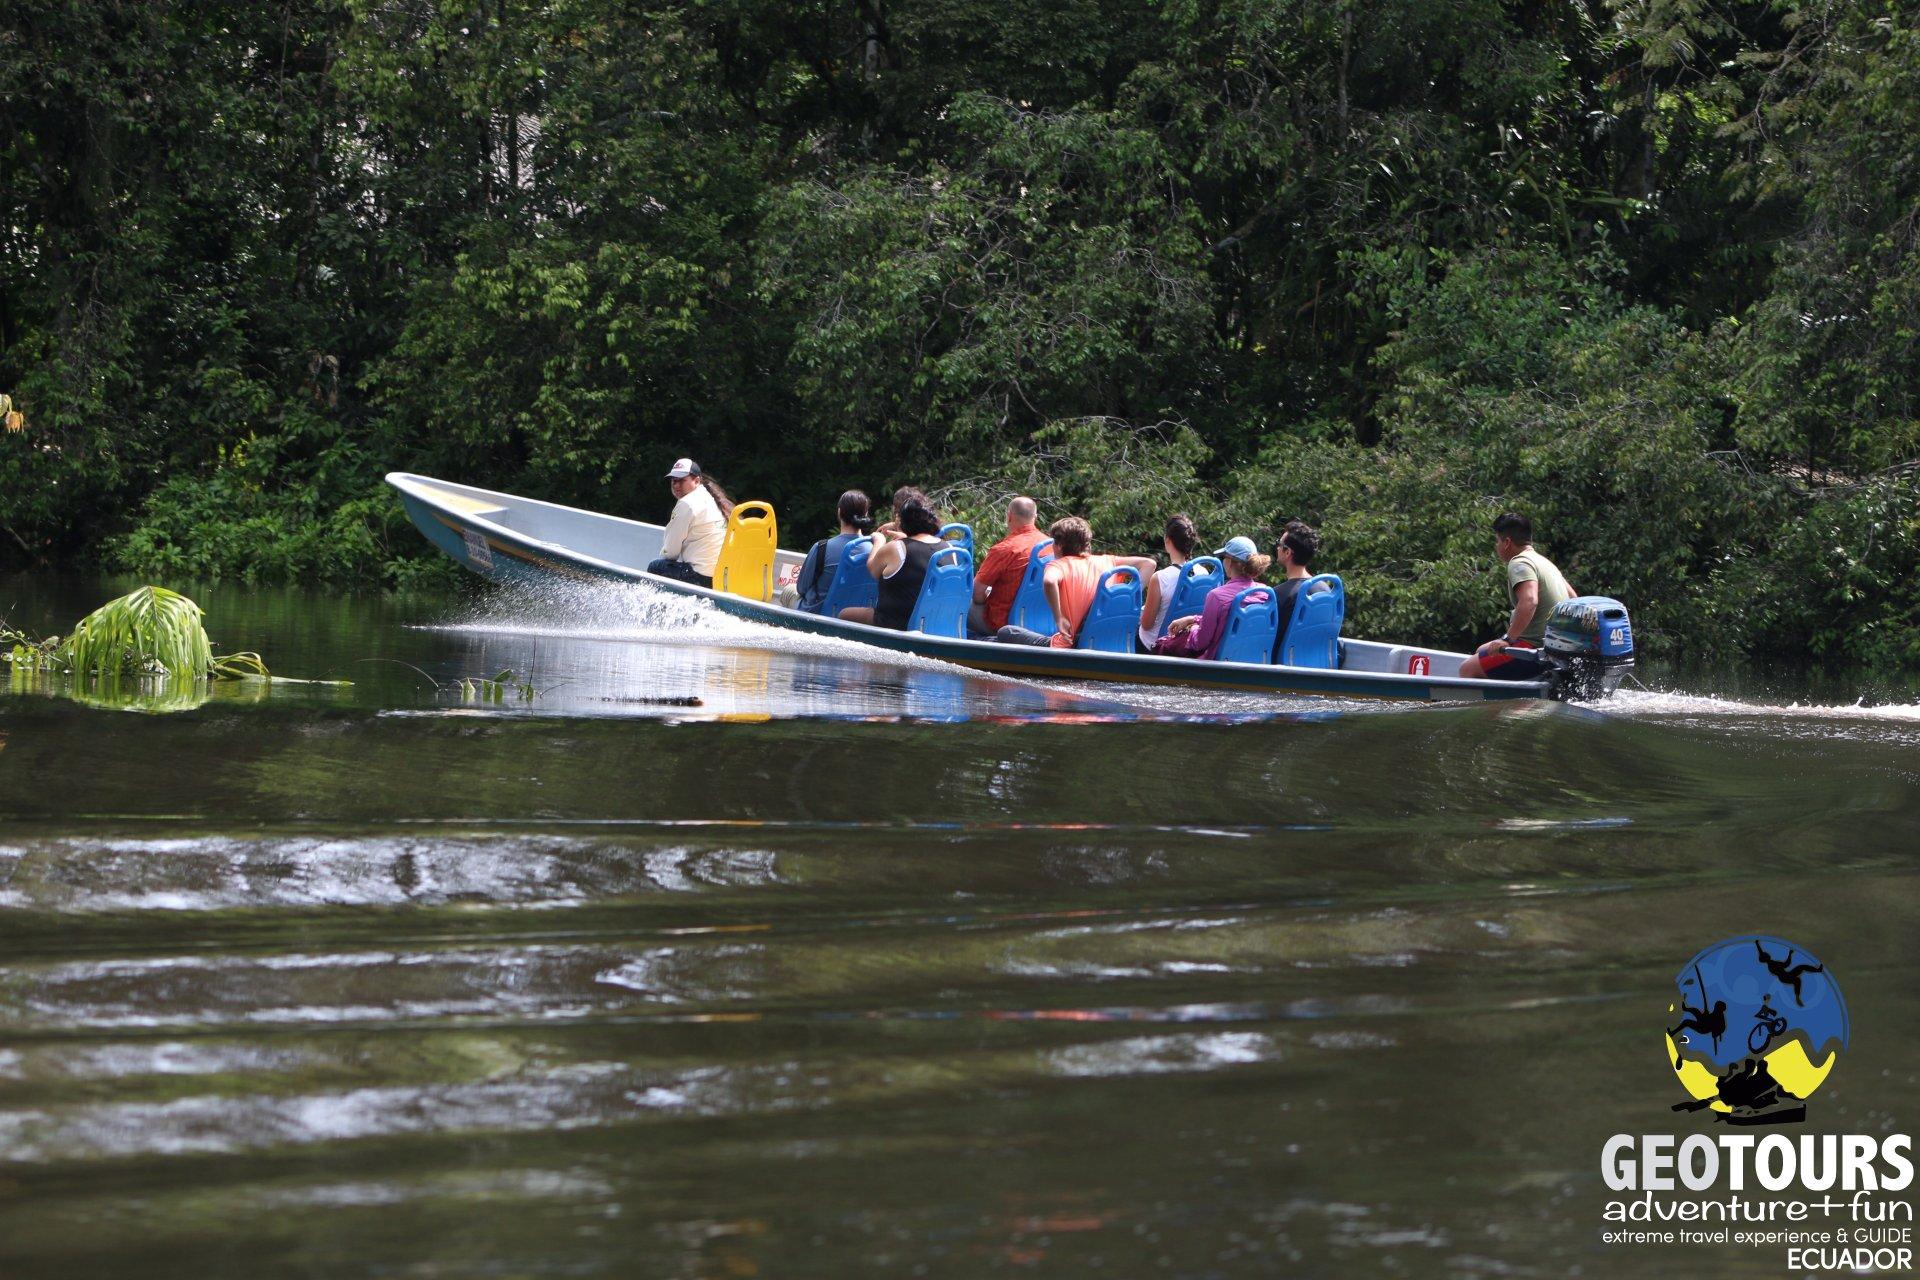 Cuyabeno Ecolodge - Vijfdaagse Tour